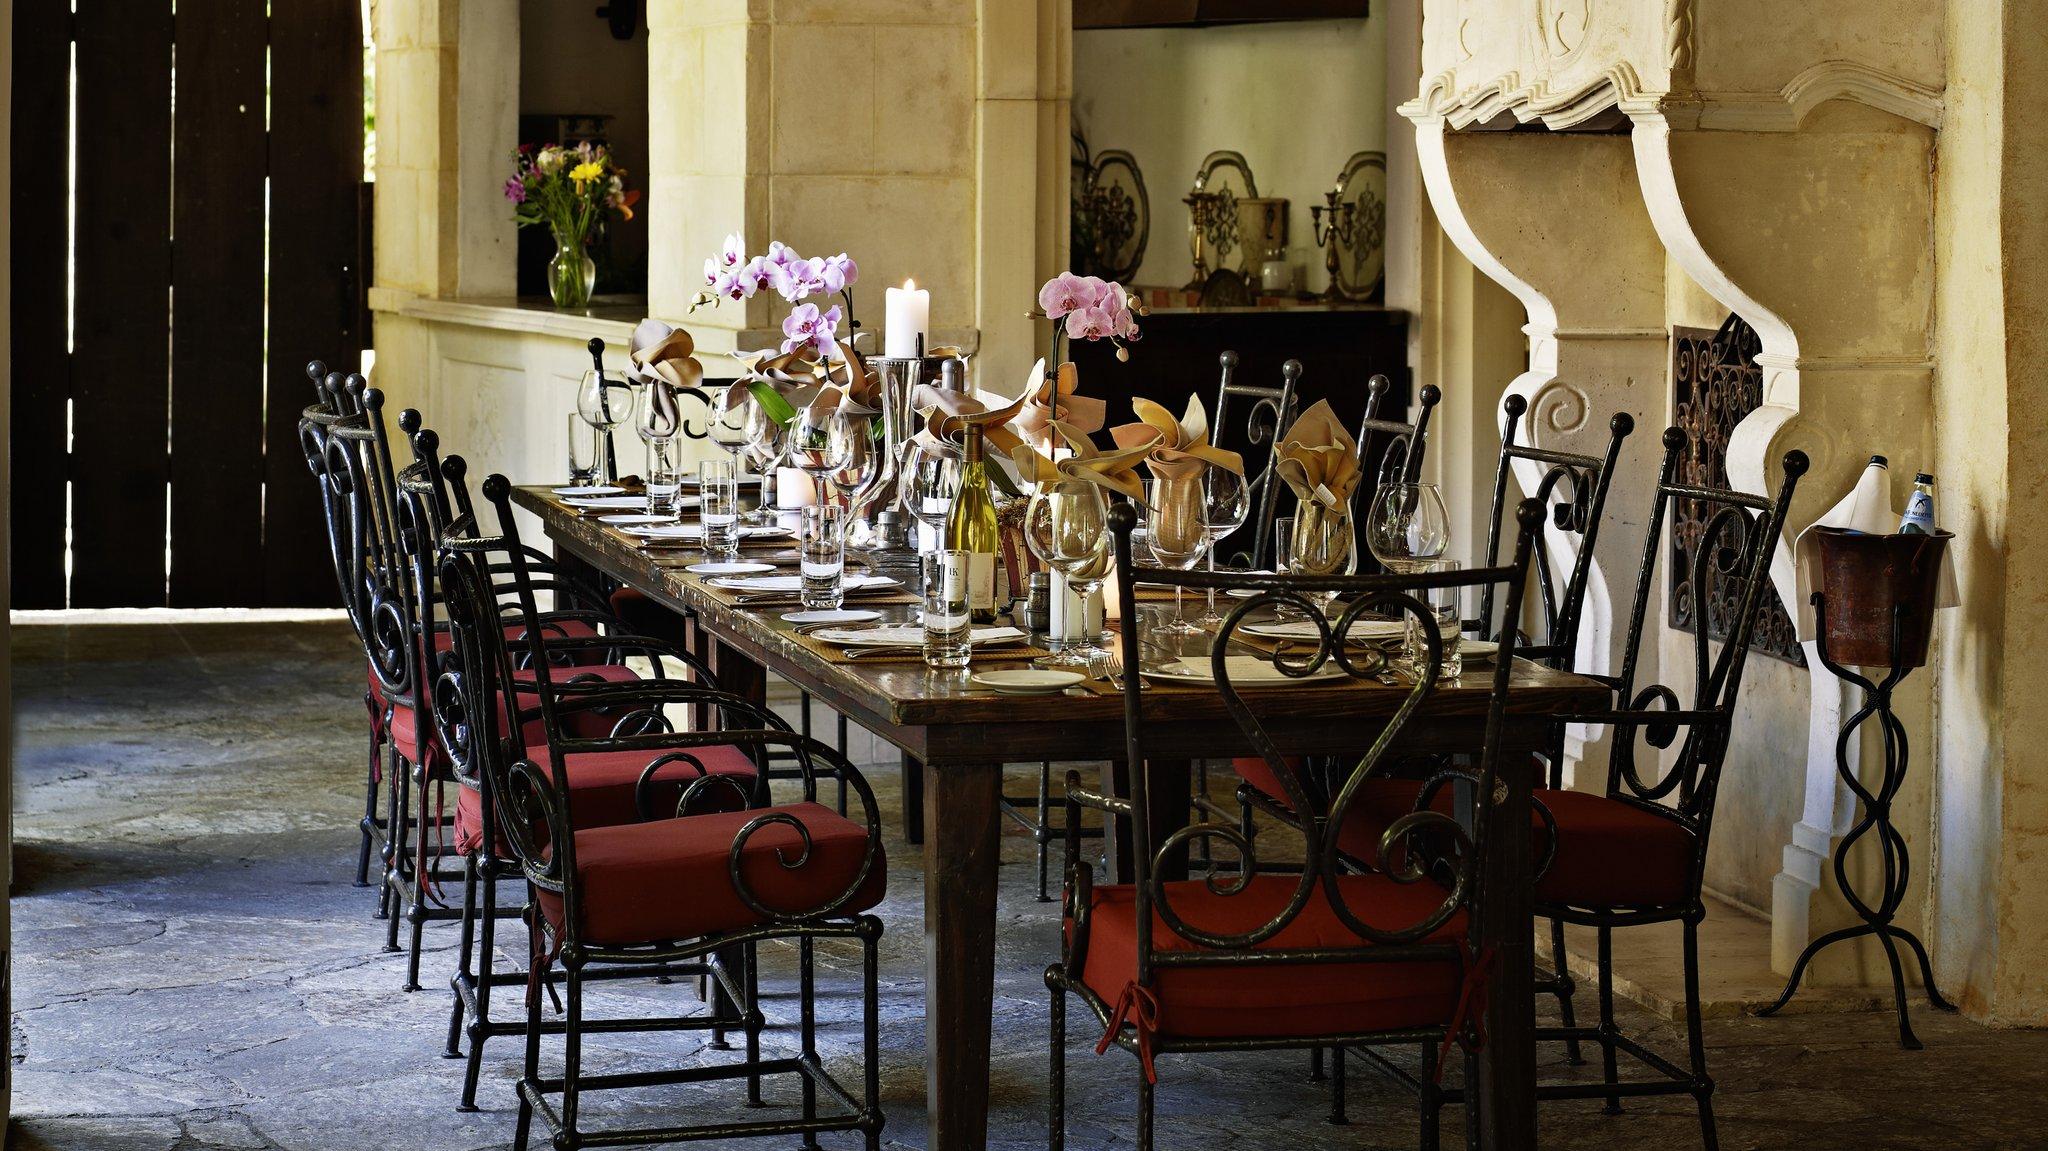 The Kenwood Inn & Spa, Four Sisters Inn